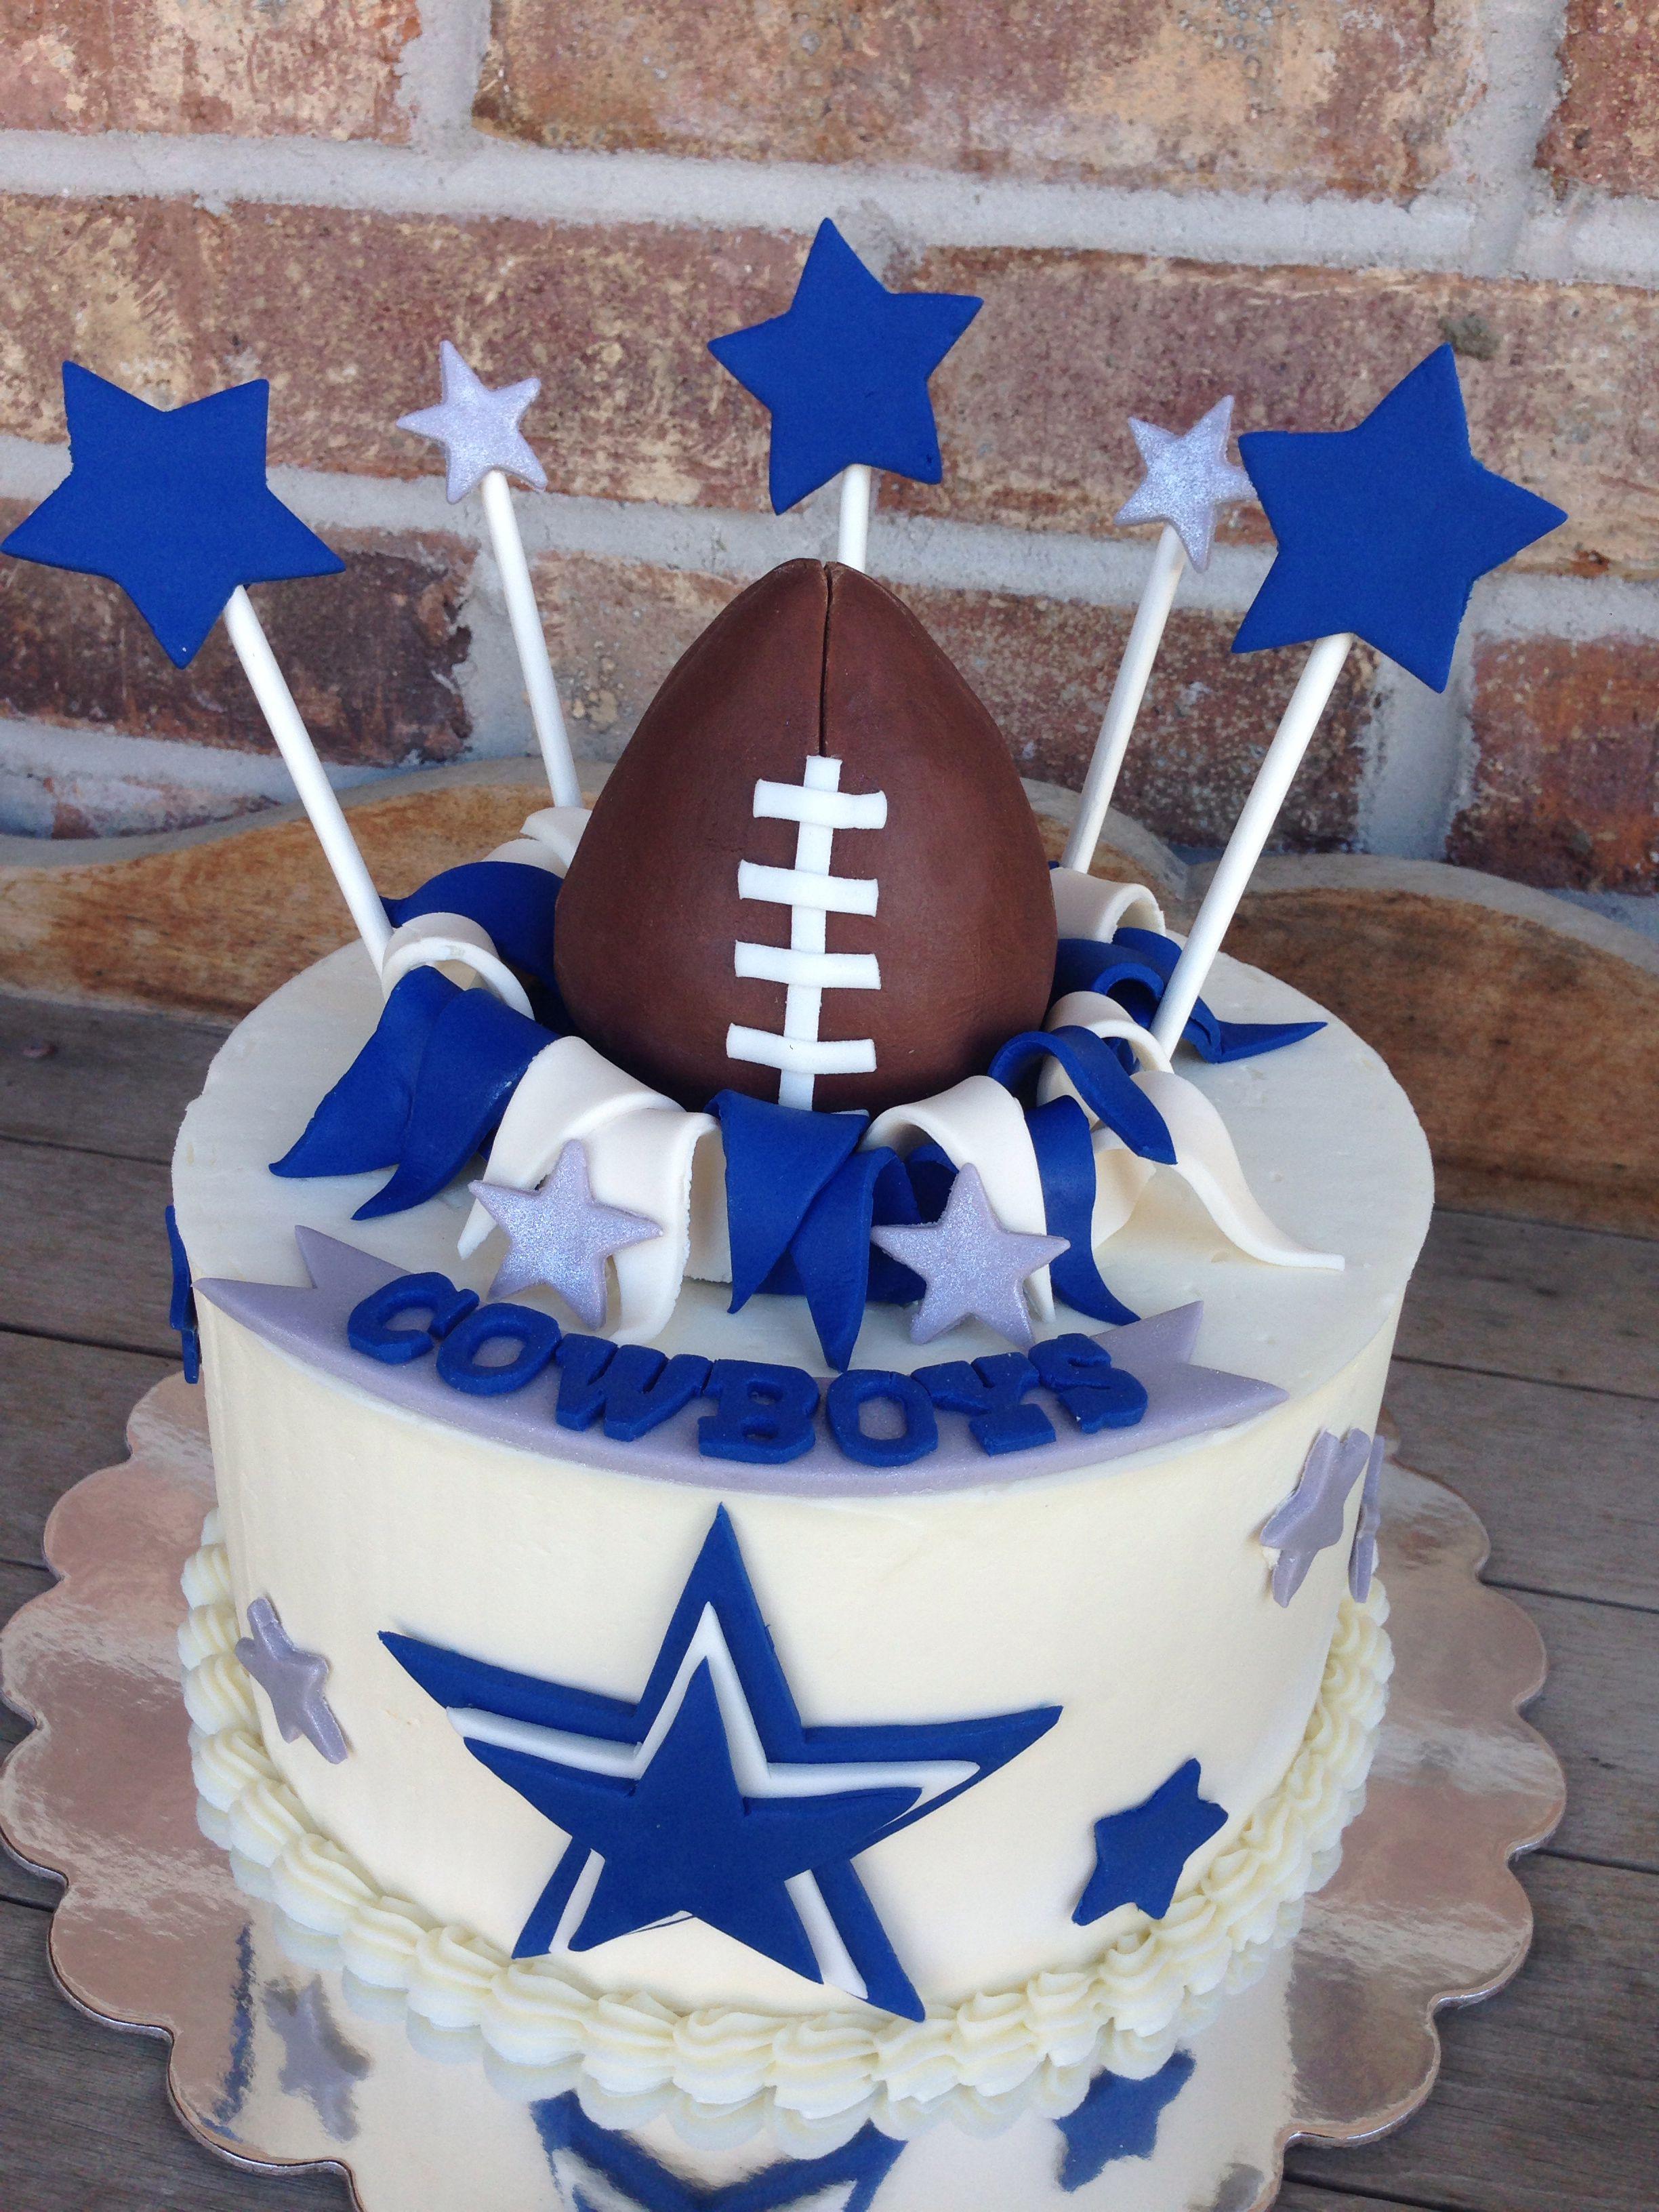 Cowboys Football Cake Dallas Cowboys Birthday Cake Dallas Cowboys Cake Cowboy Birthday Cakes